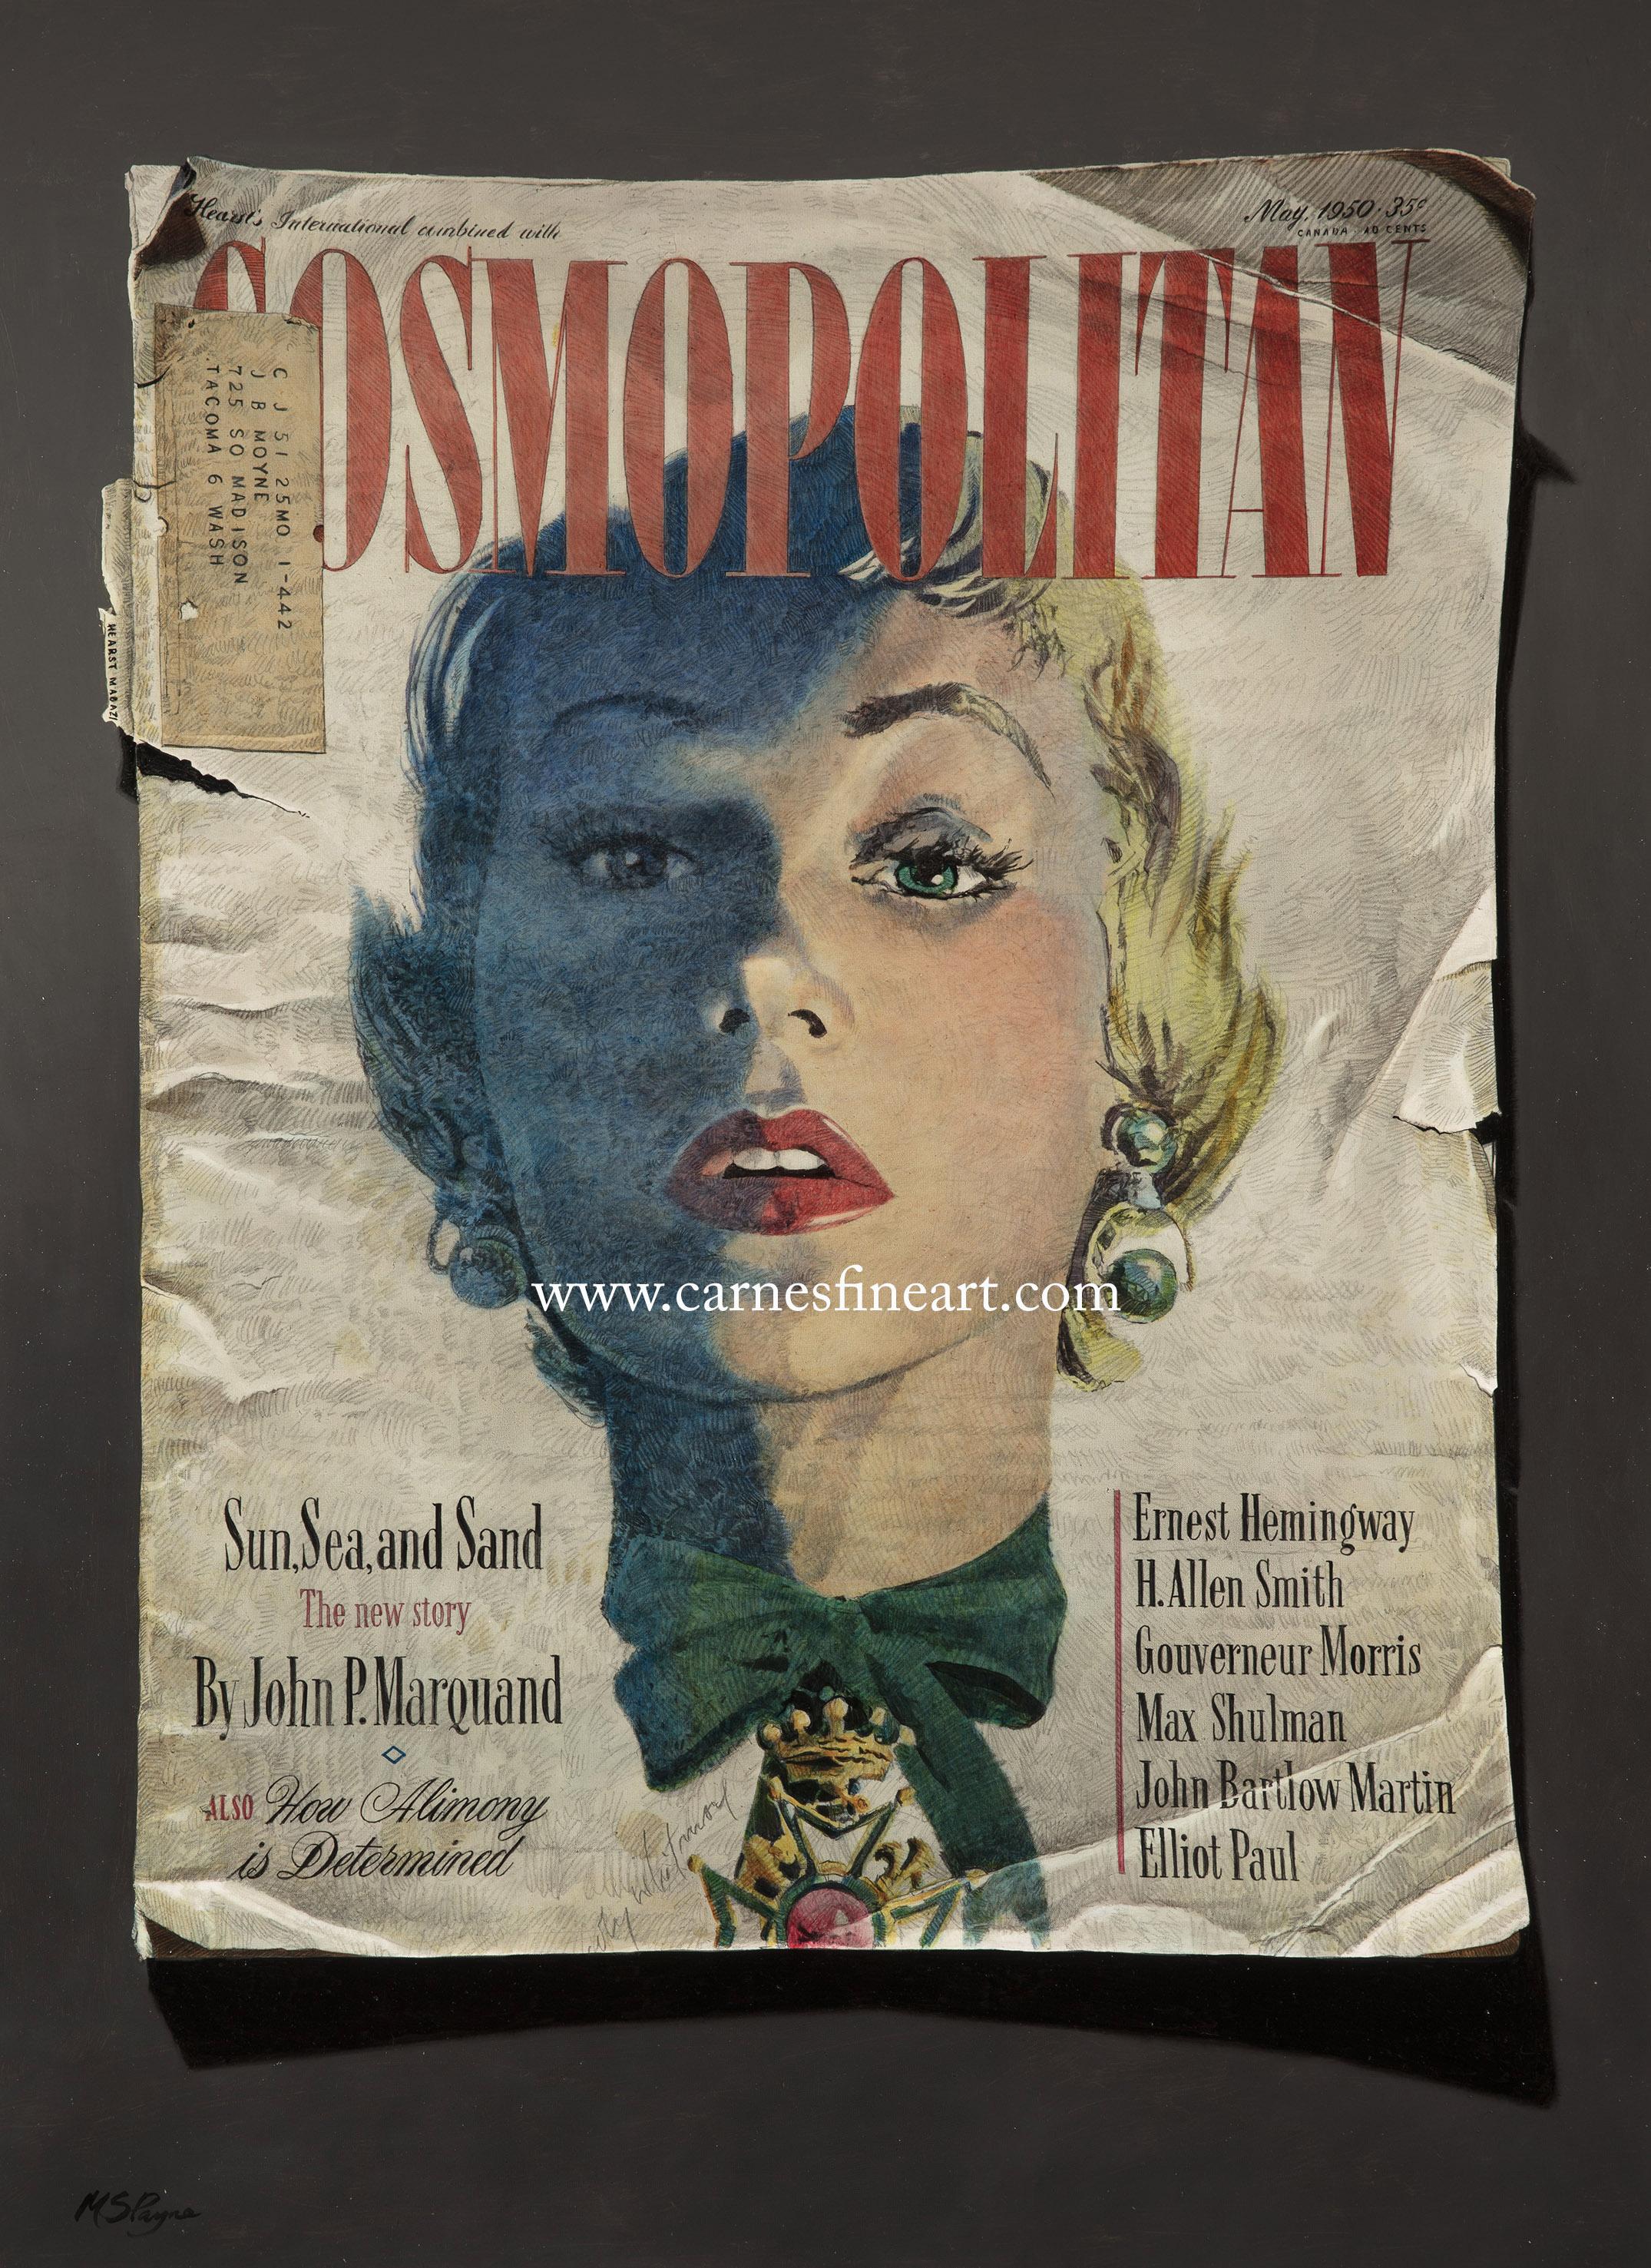 Cosmopolitan May 1950 (NEW)